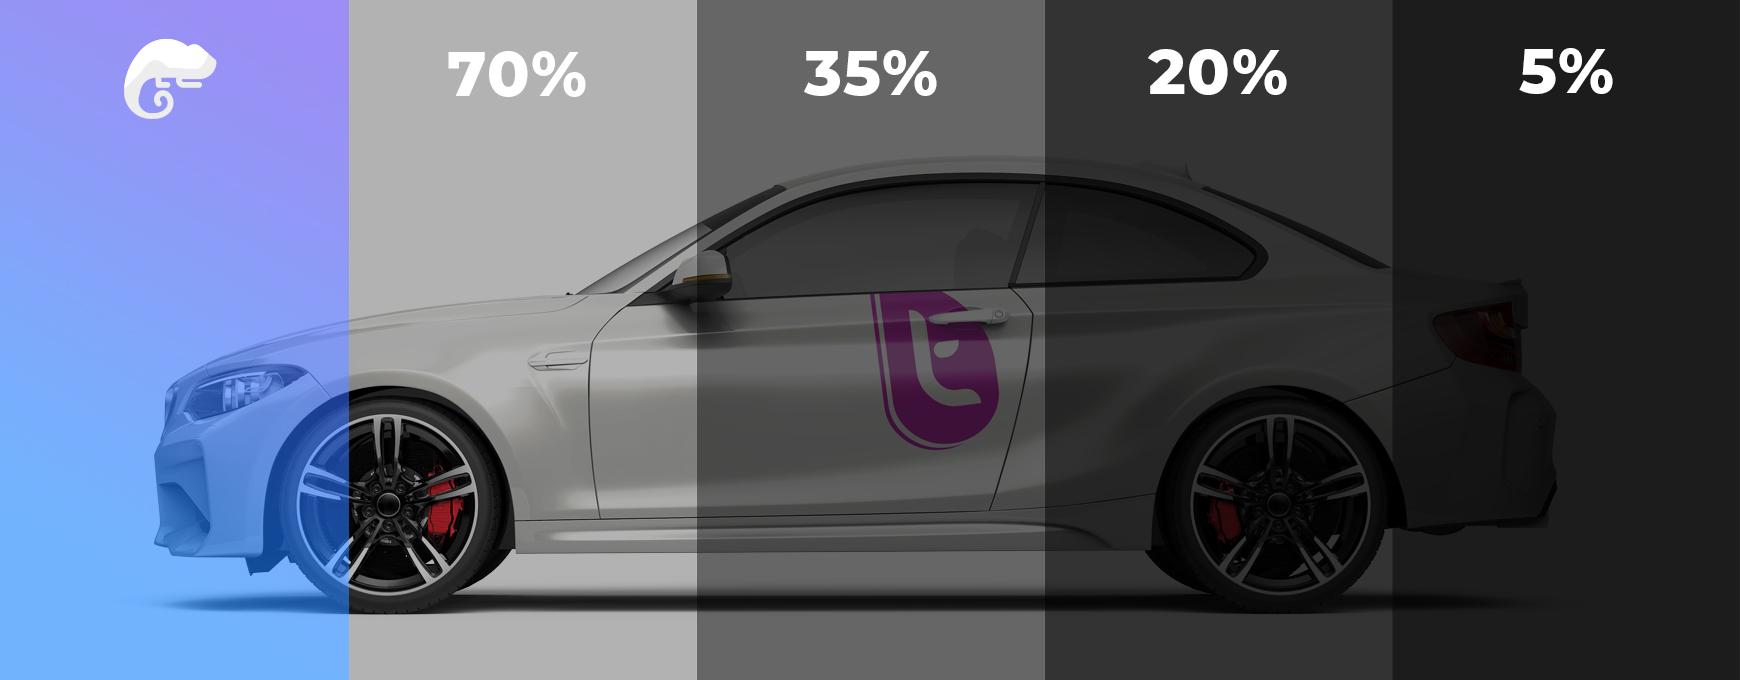 Verschillende percentages tinten